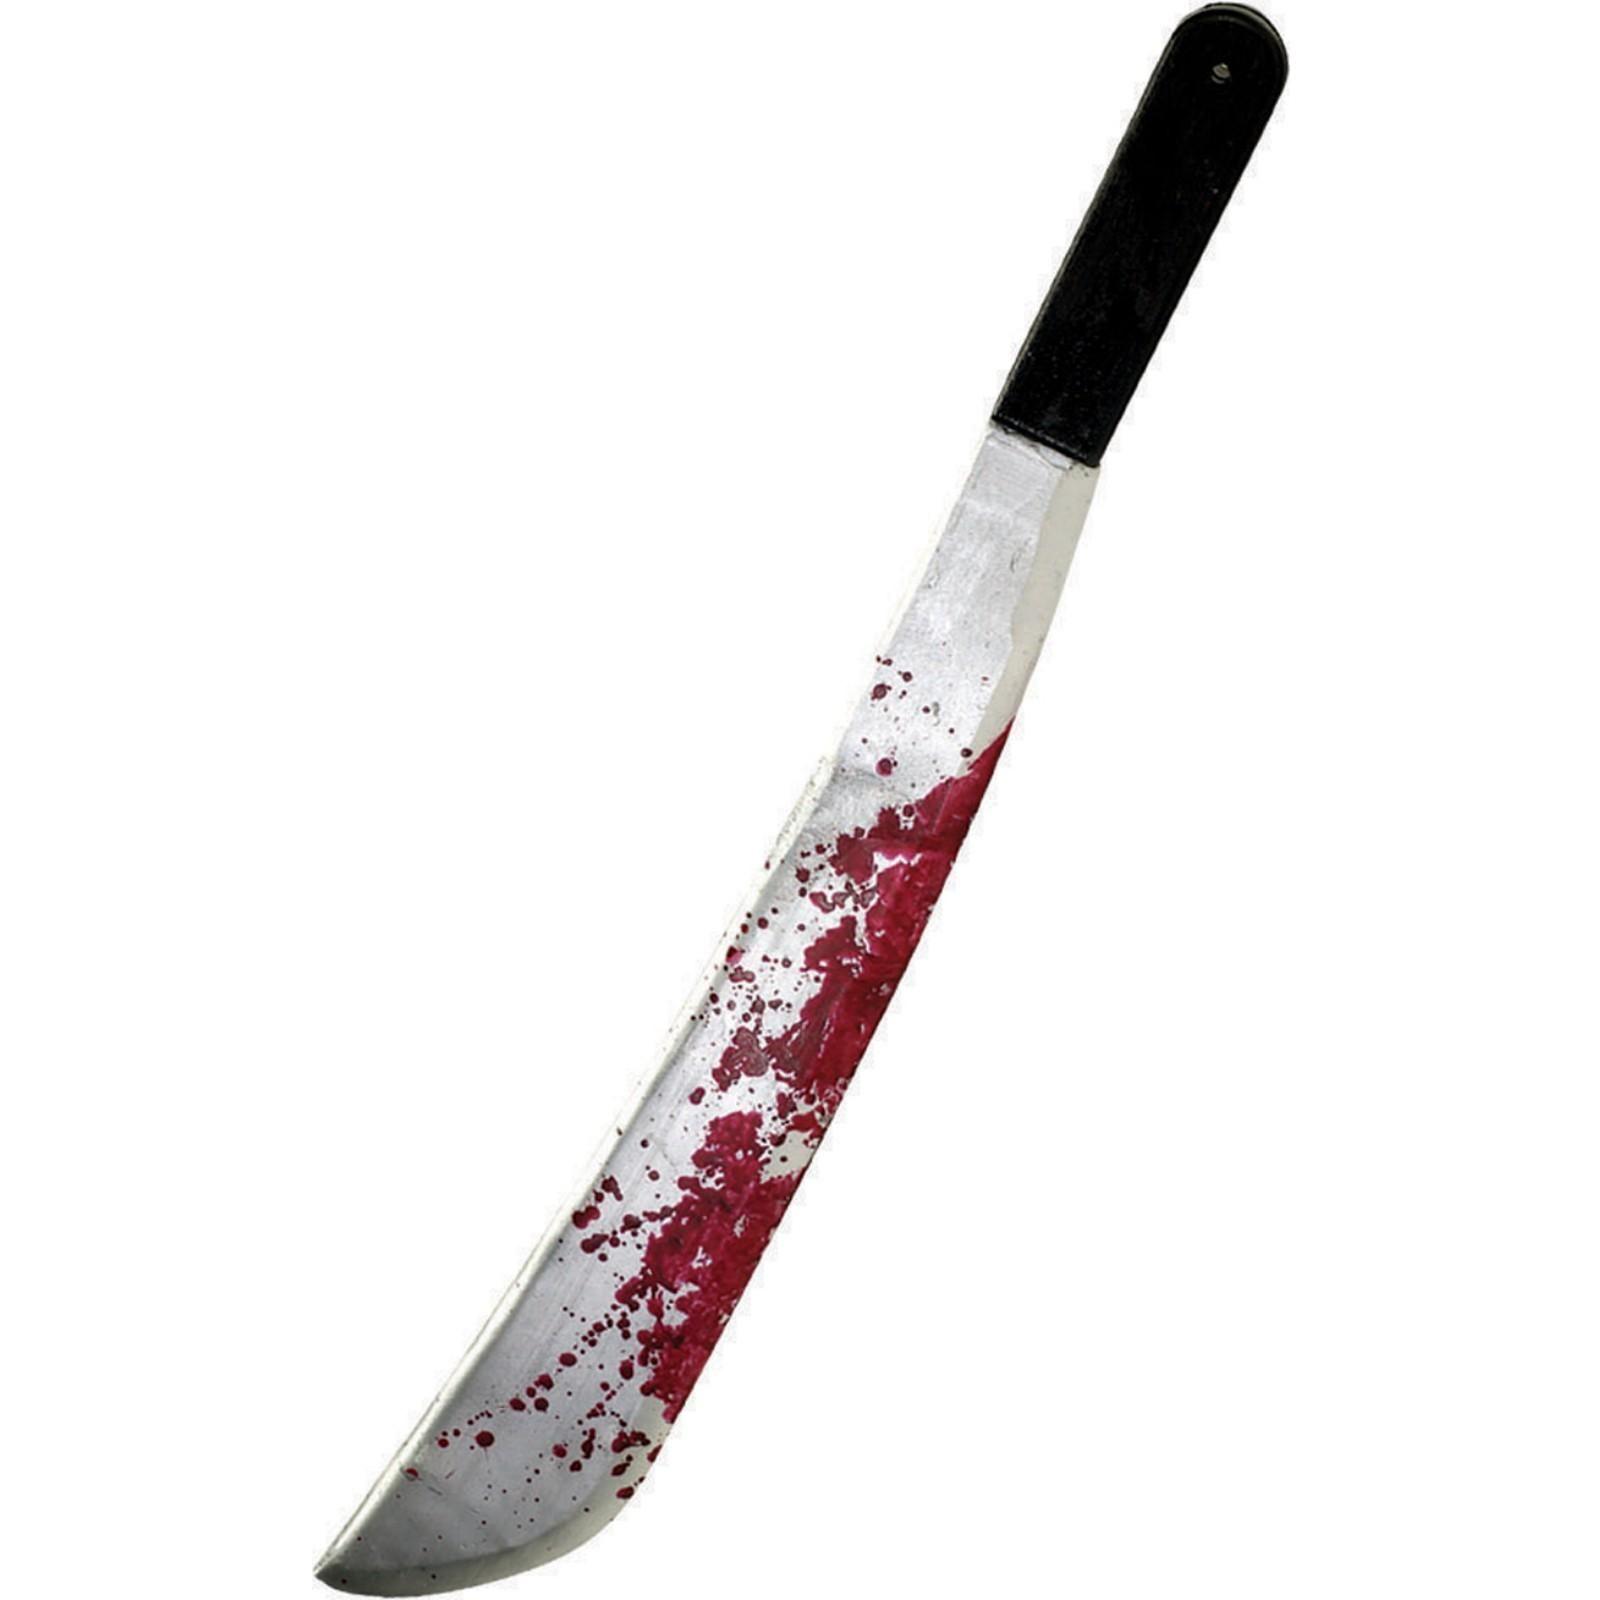 Plastic Machete Halloween Weapon Accessory